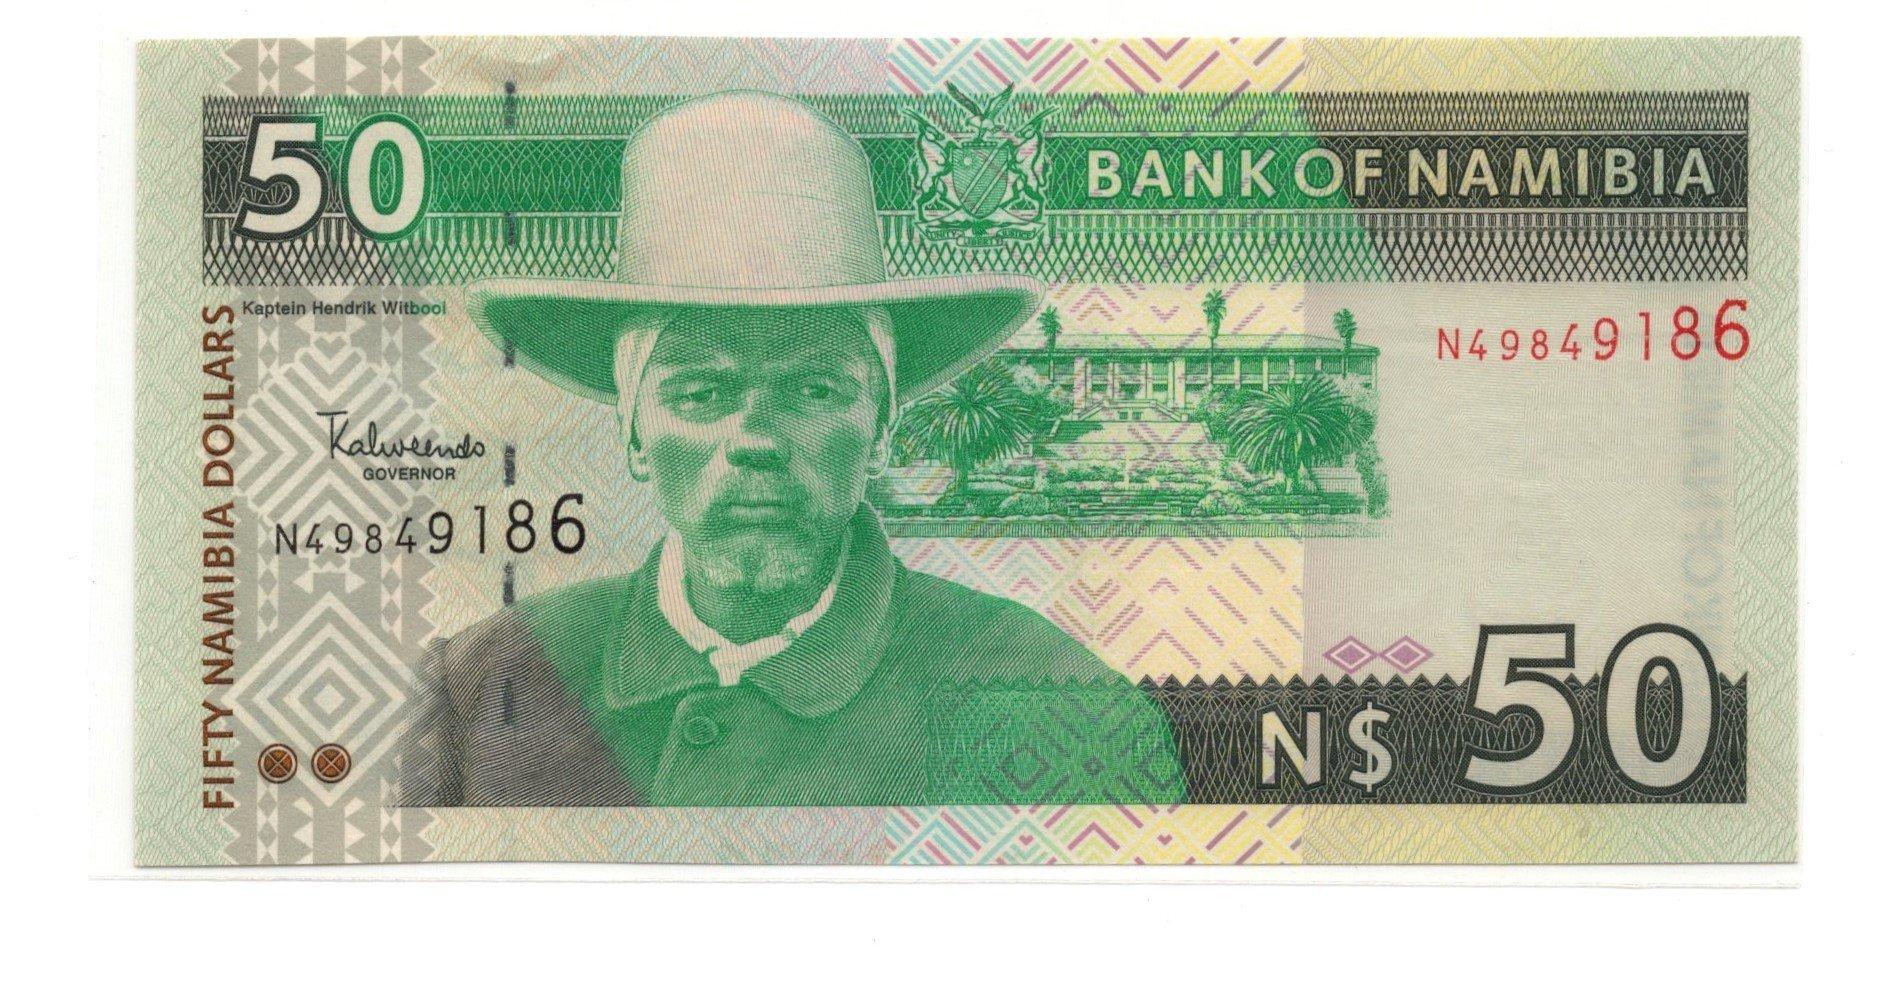 Namibia 50 dollars banknote